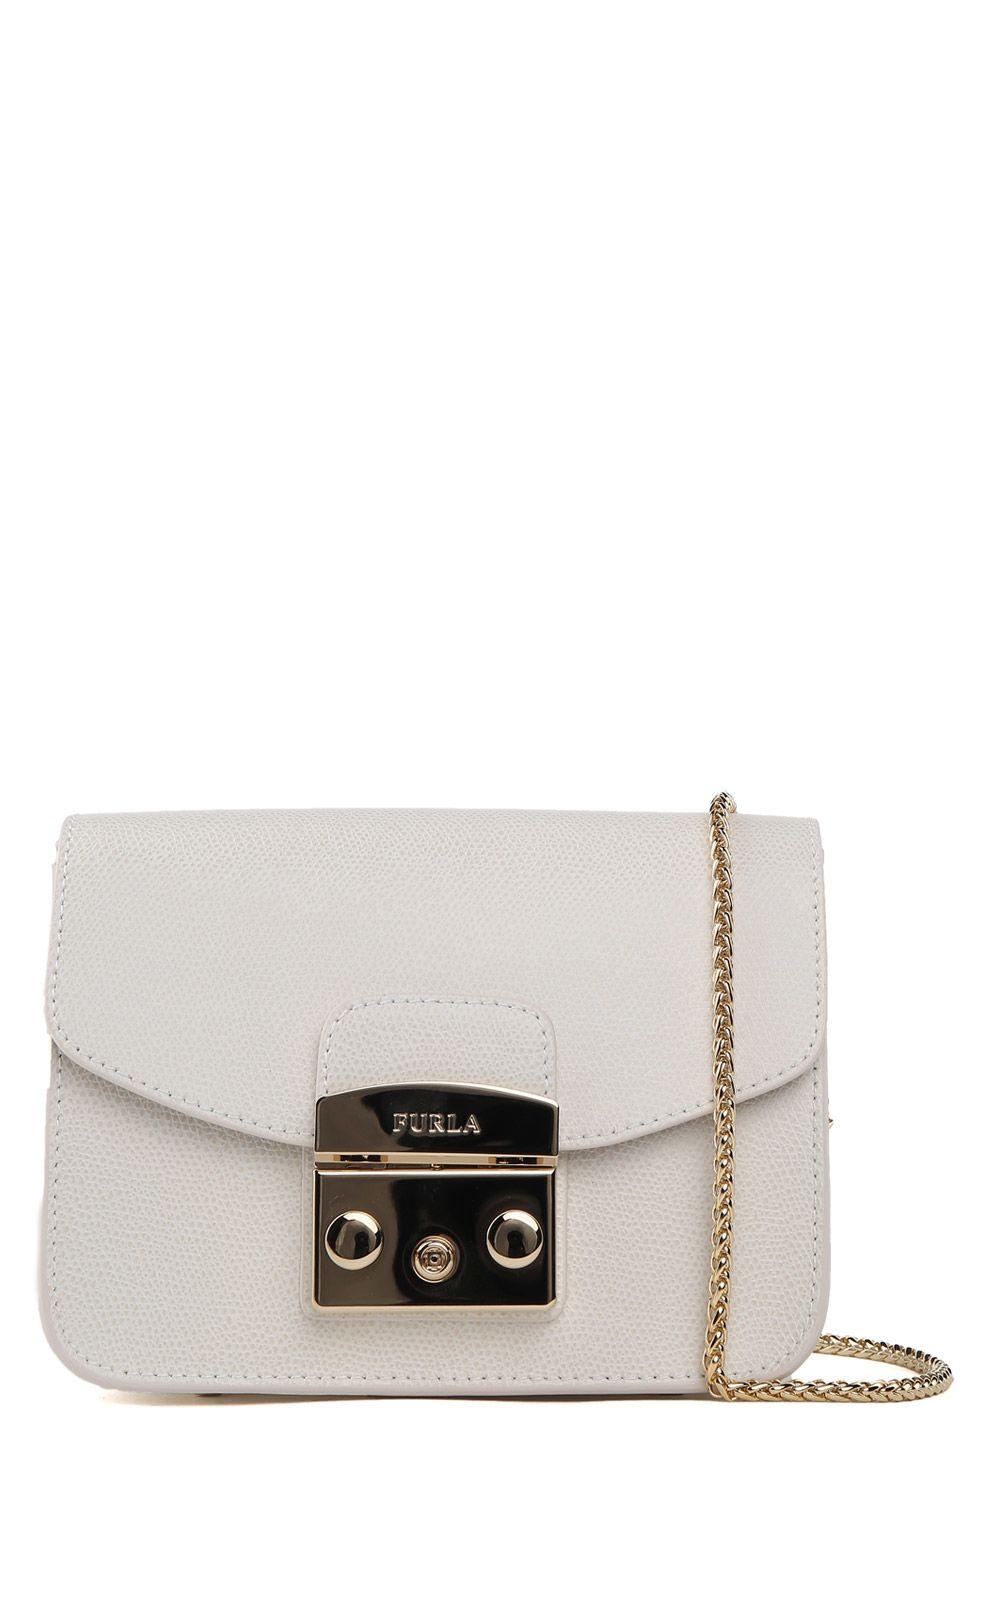 Furla Mini Metropolis Textured-leather Crossbody Bag